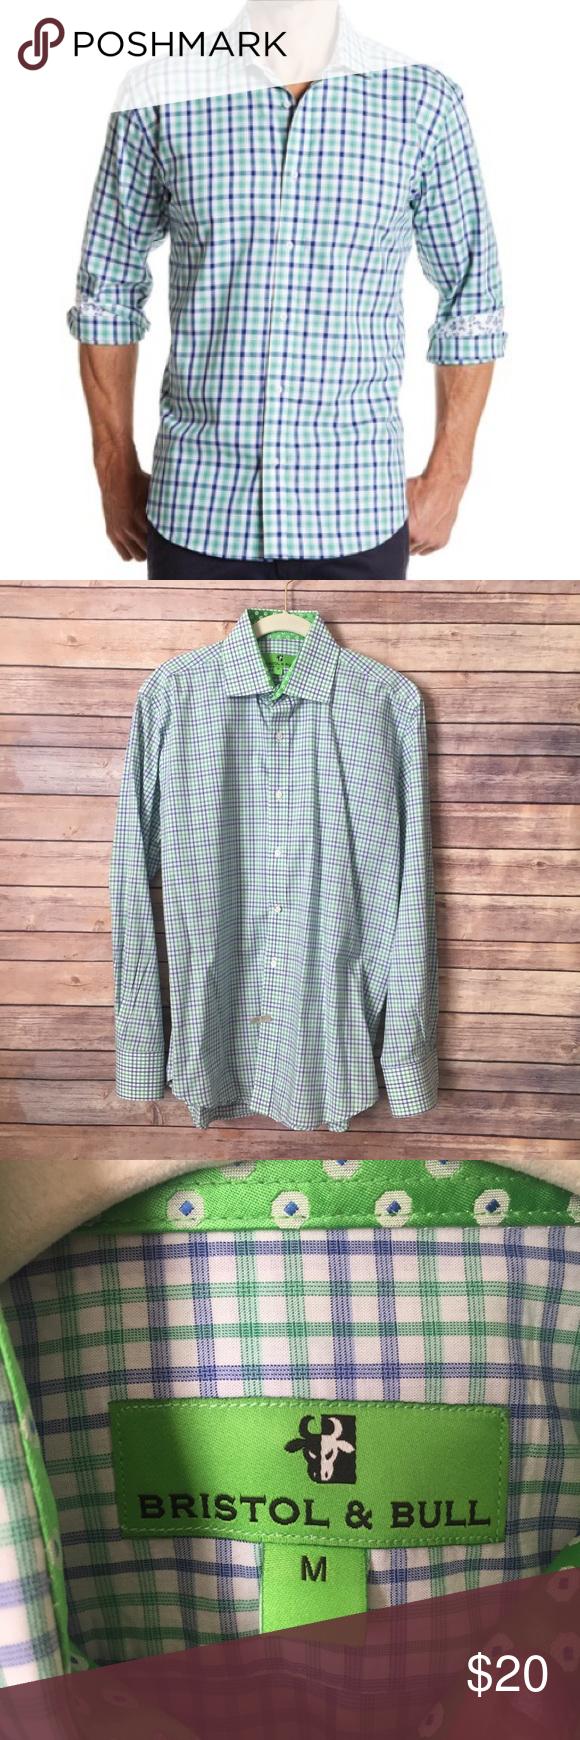 Green checkered dress shirt  Bristol u Bull Checkered Classic Fit Sport Shirt M  Bulls shirt